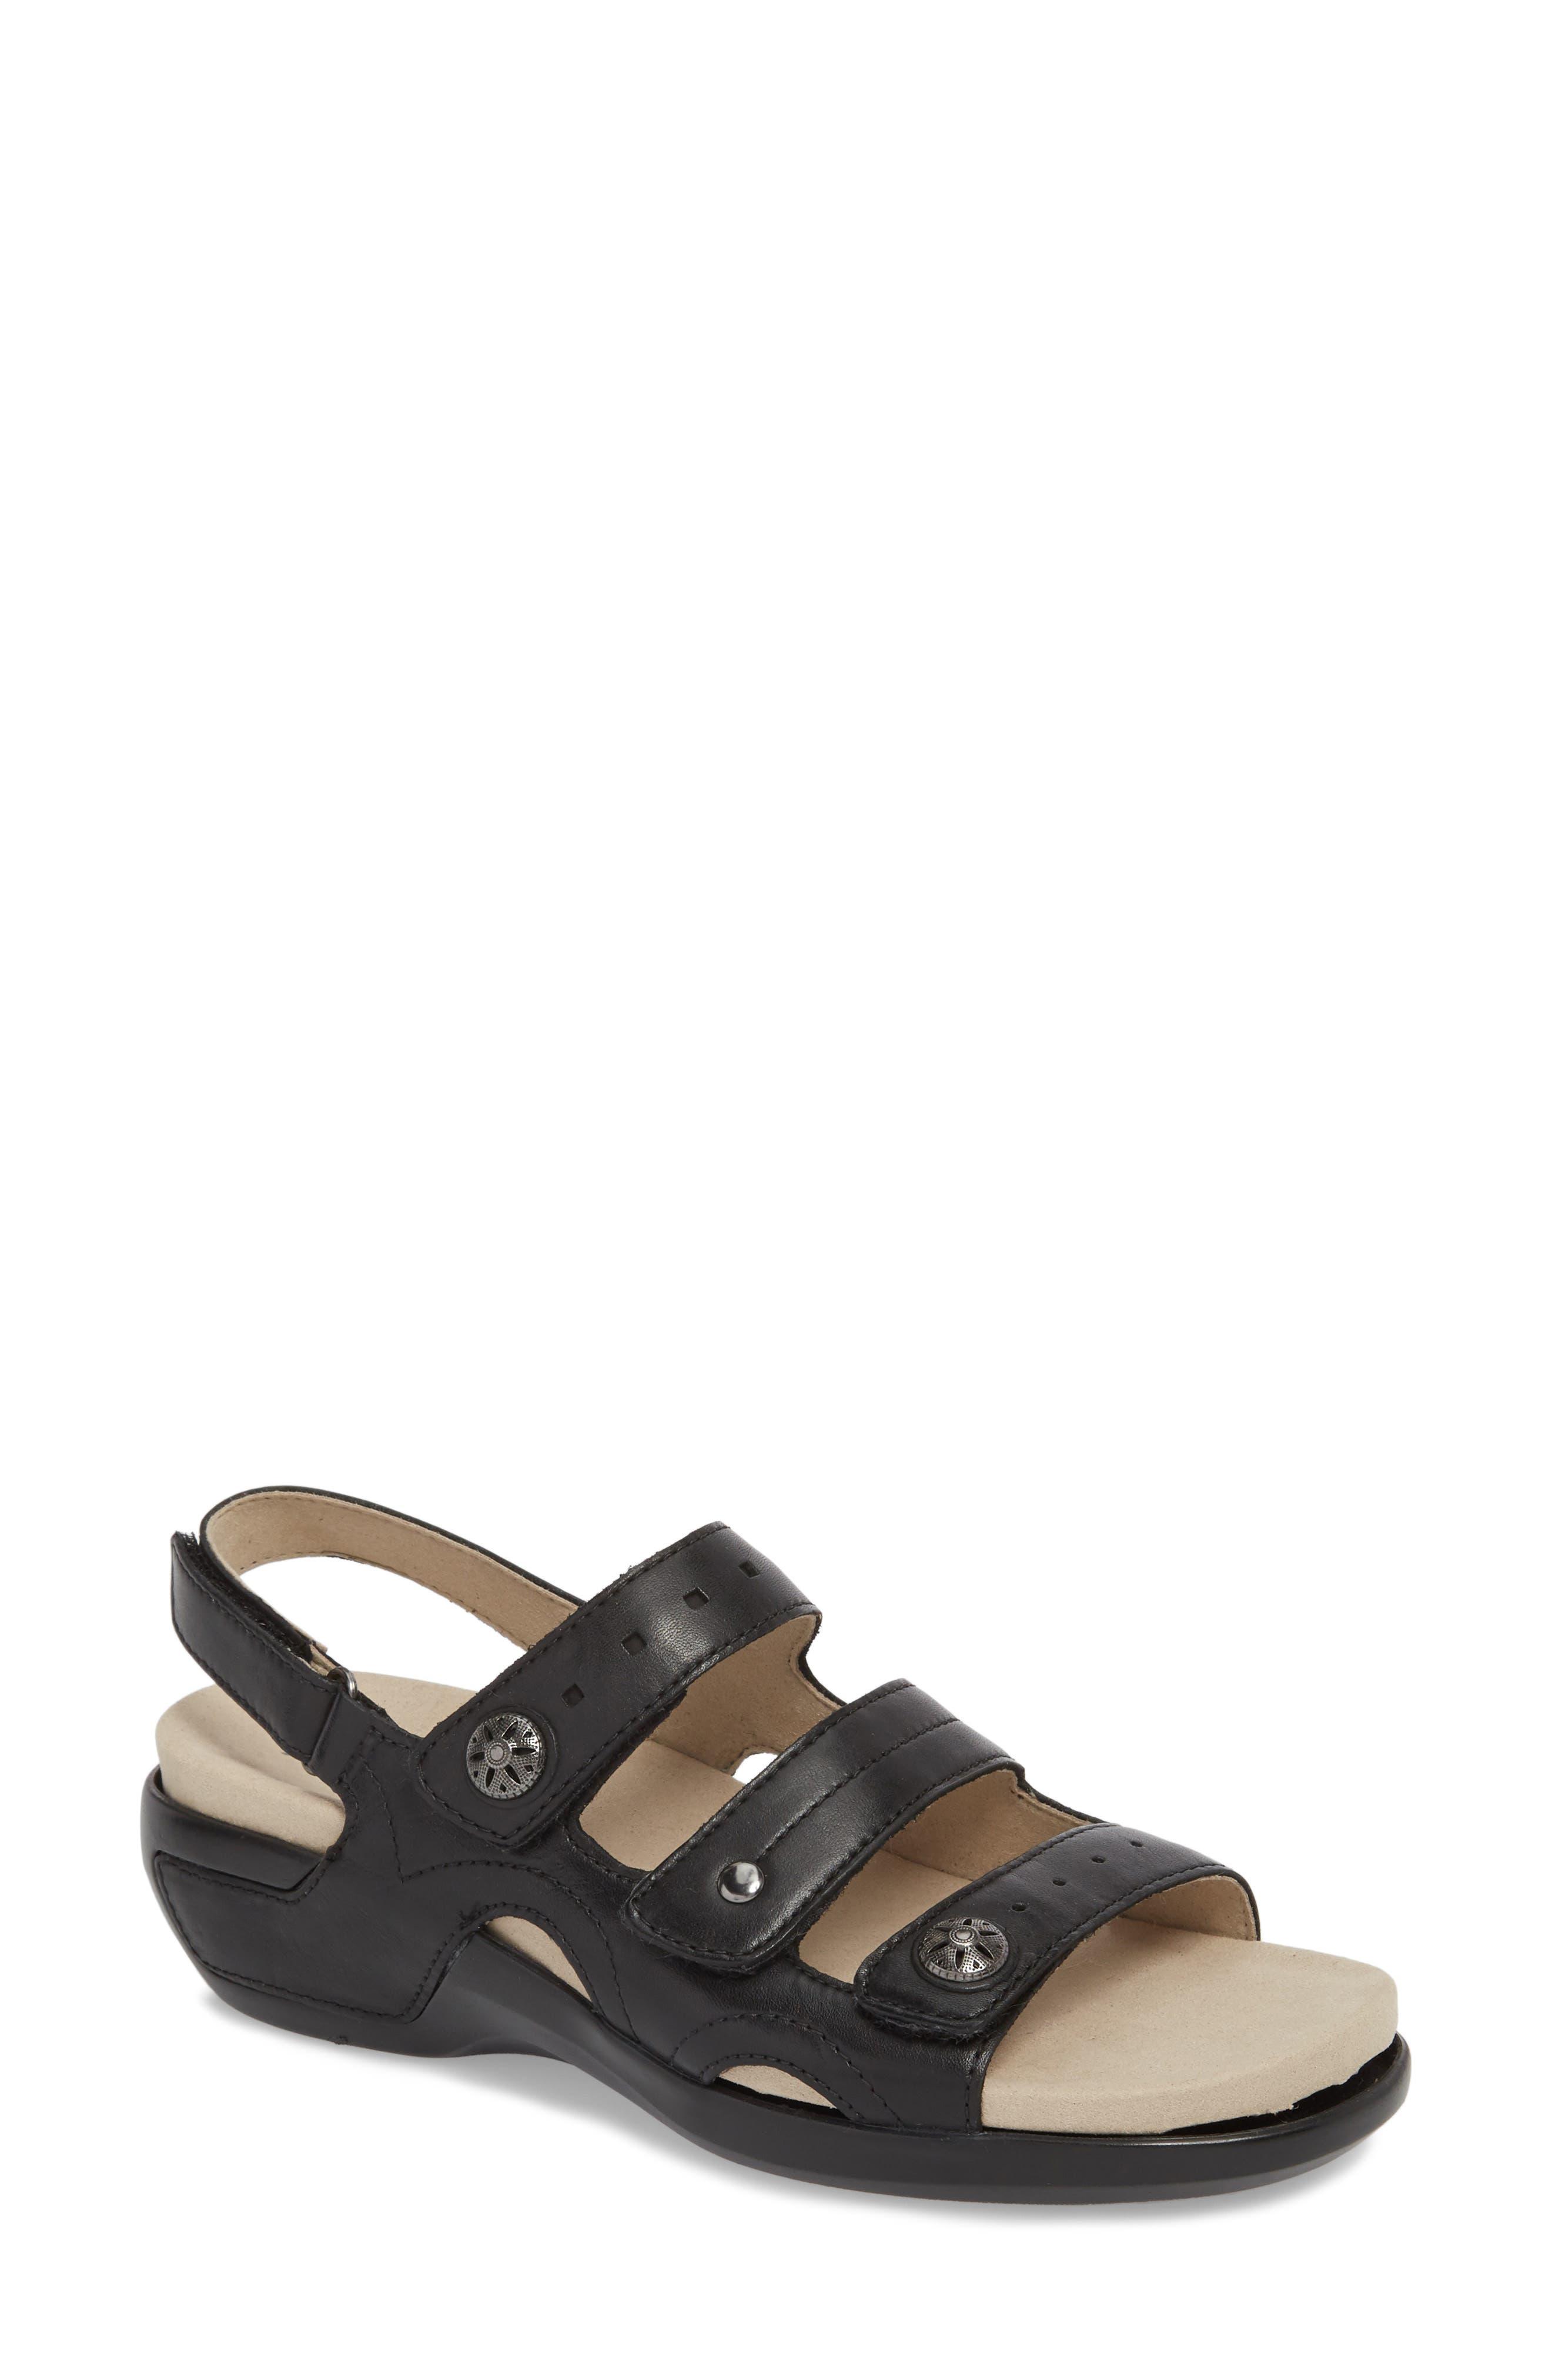 Three Strap Sandal,                             Main thumbnail 1, color,                             BLACK LEATHER